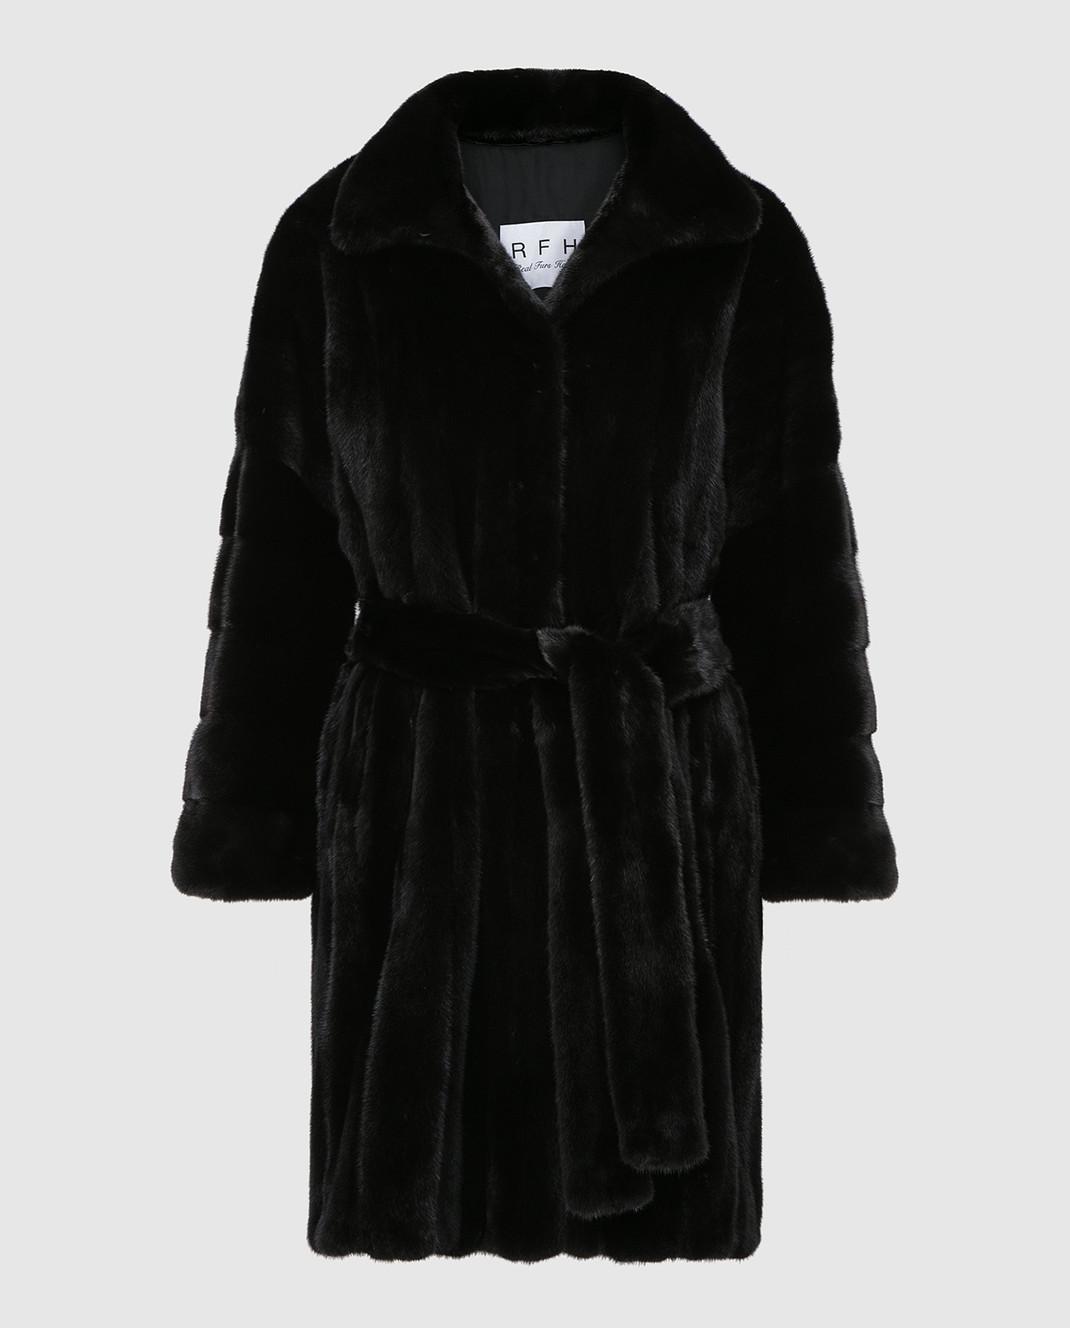 Real Furs House Черное меховое пальто TB5253842